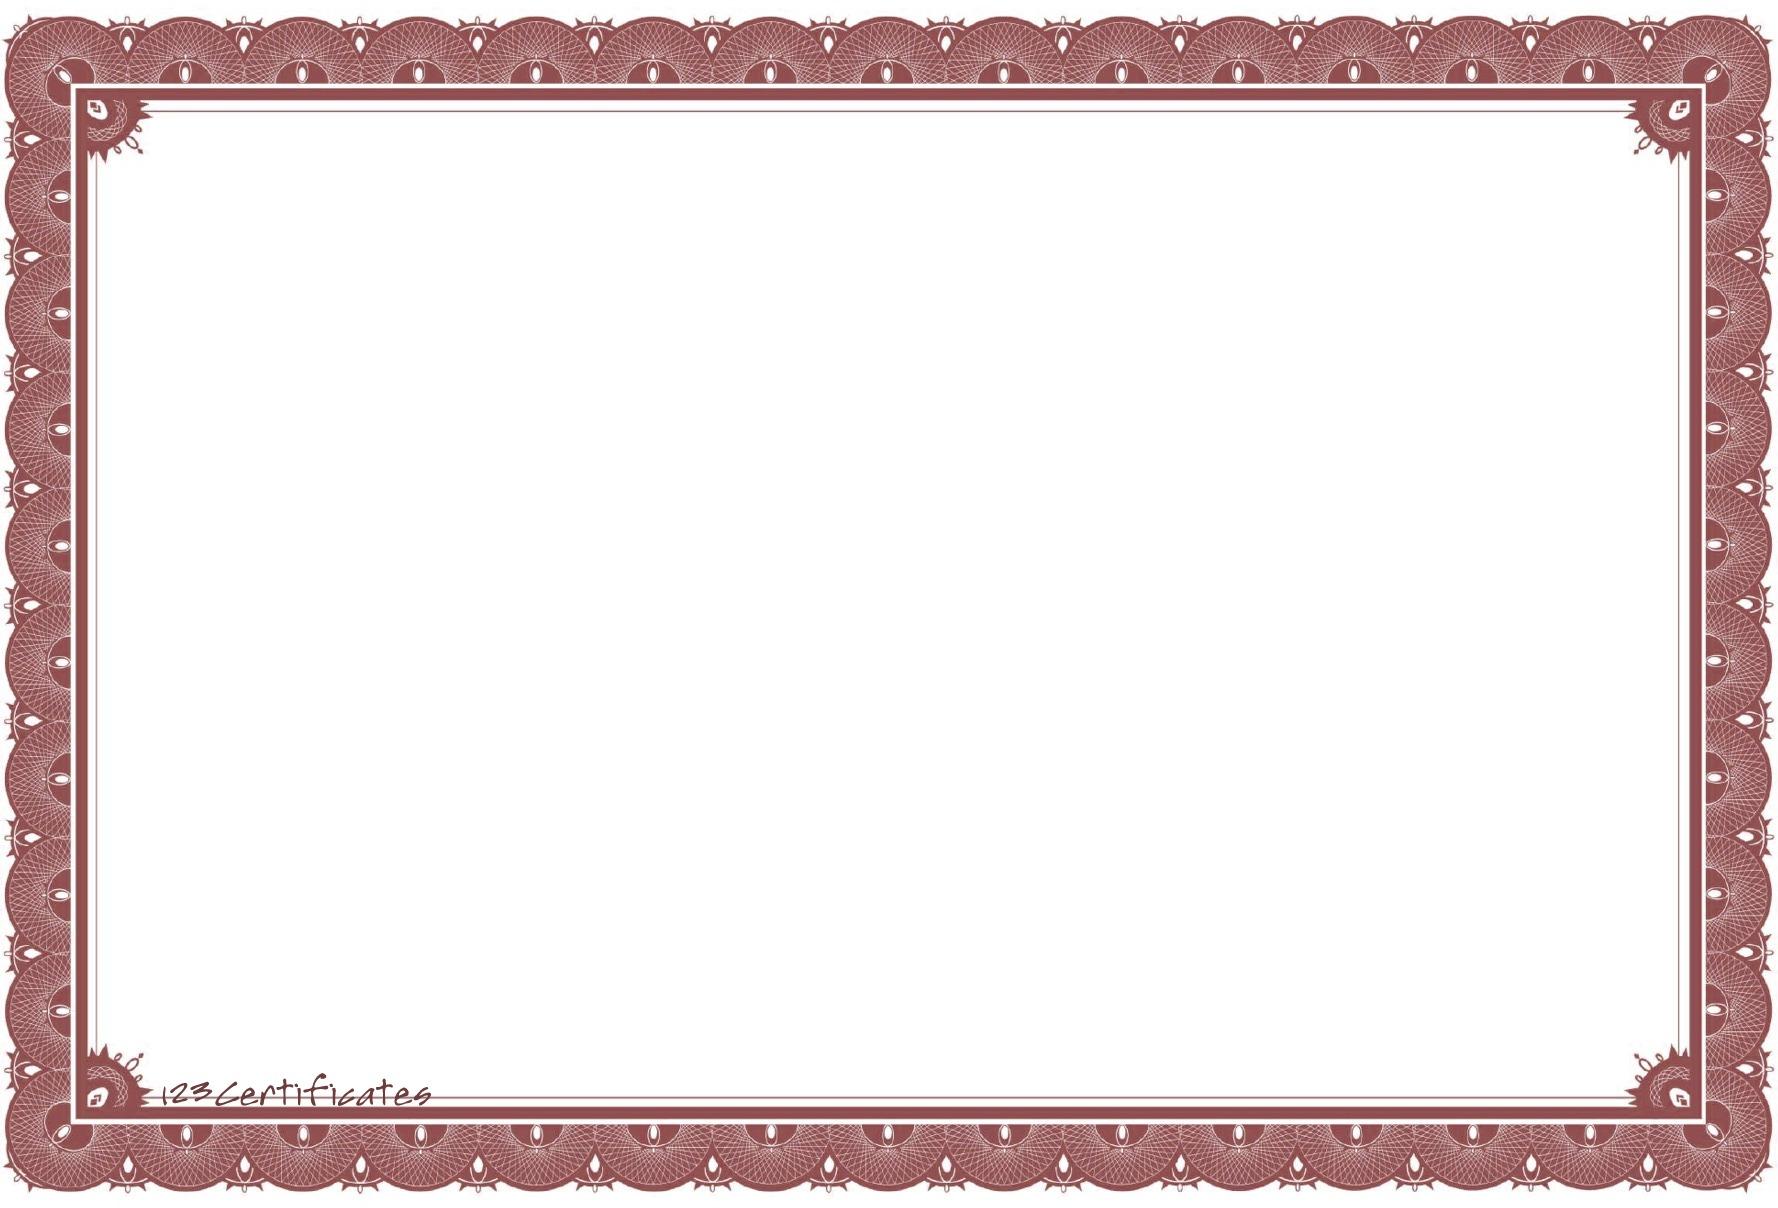 Free Certificate Borders, Download Free Clip Art, Free